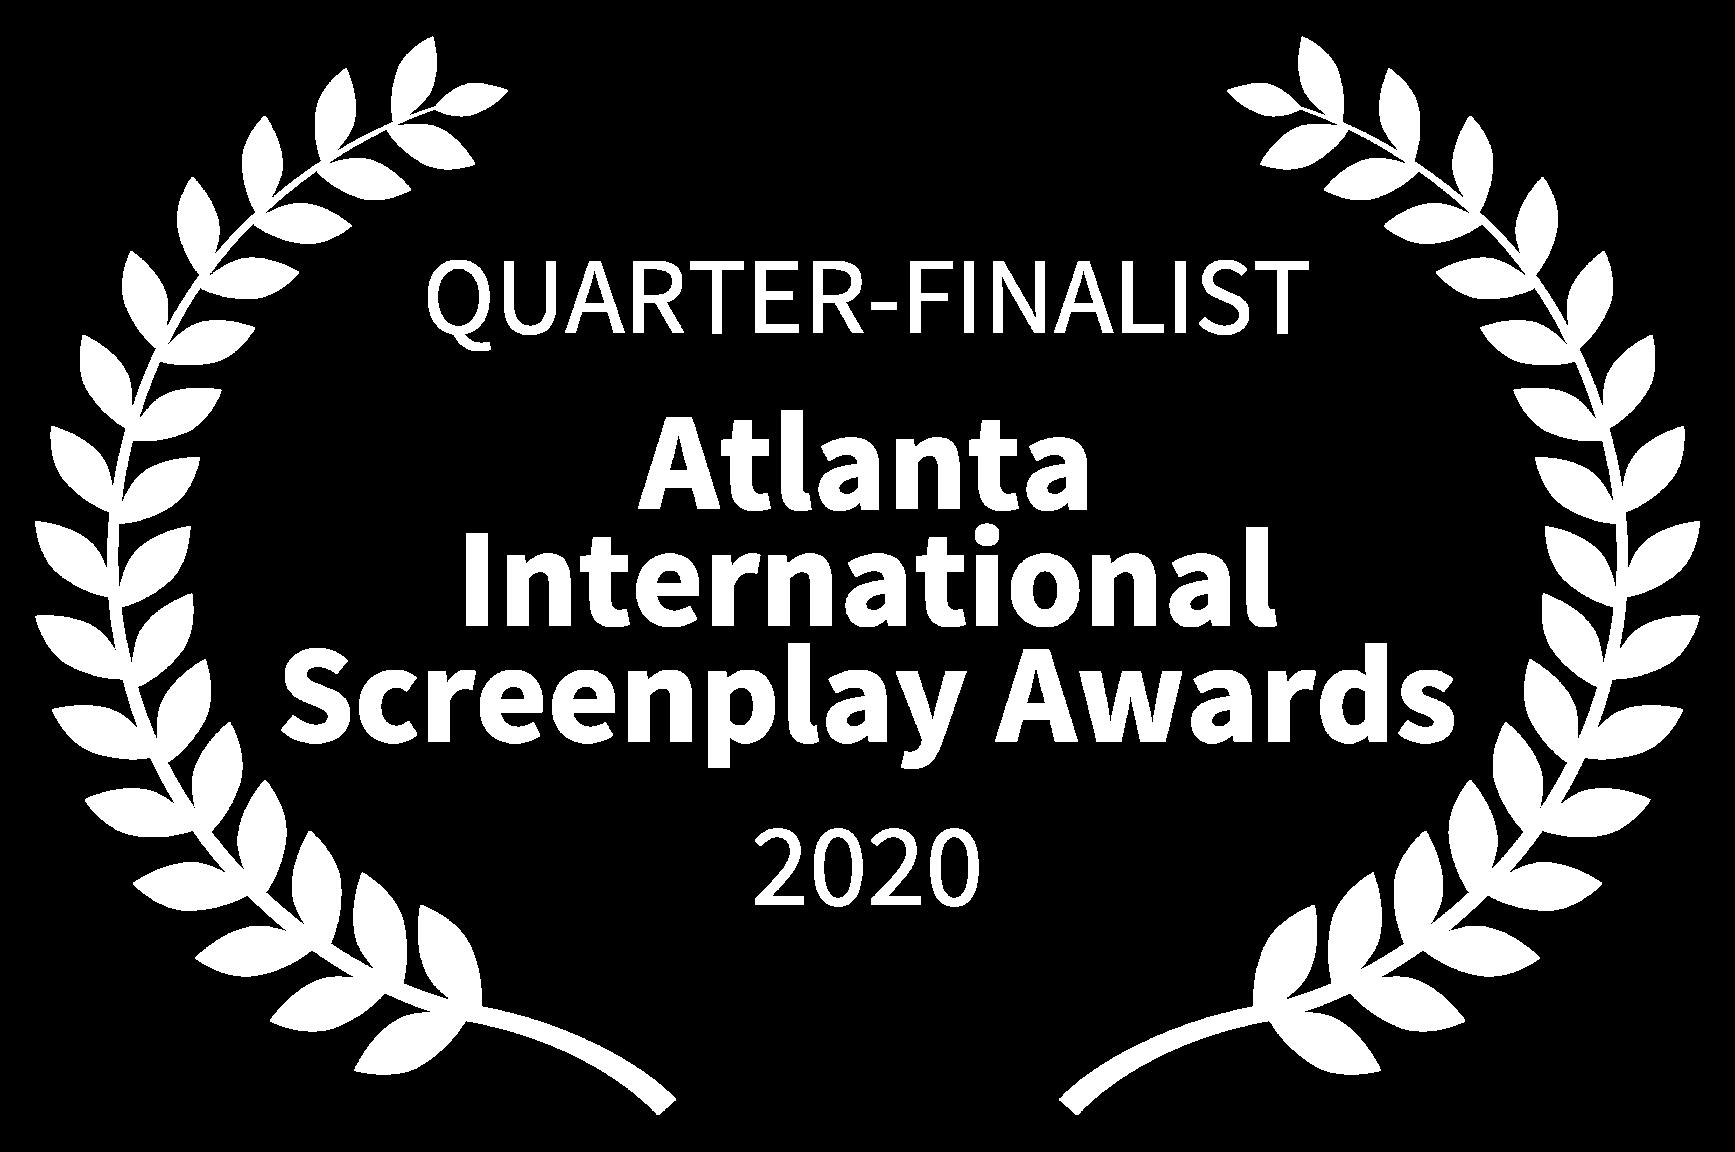 QUARTER-FINALIST - Atlanta International Screenplay Awards - 2020